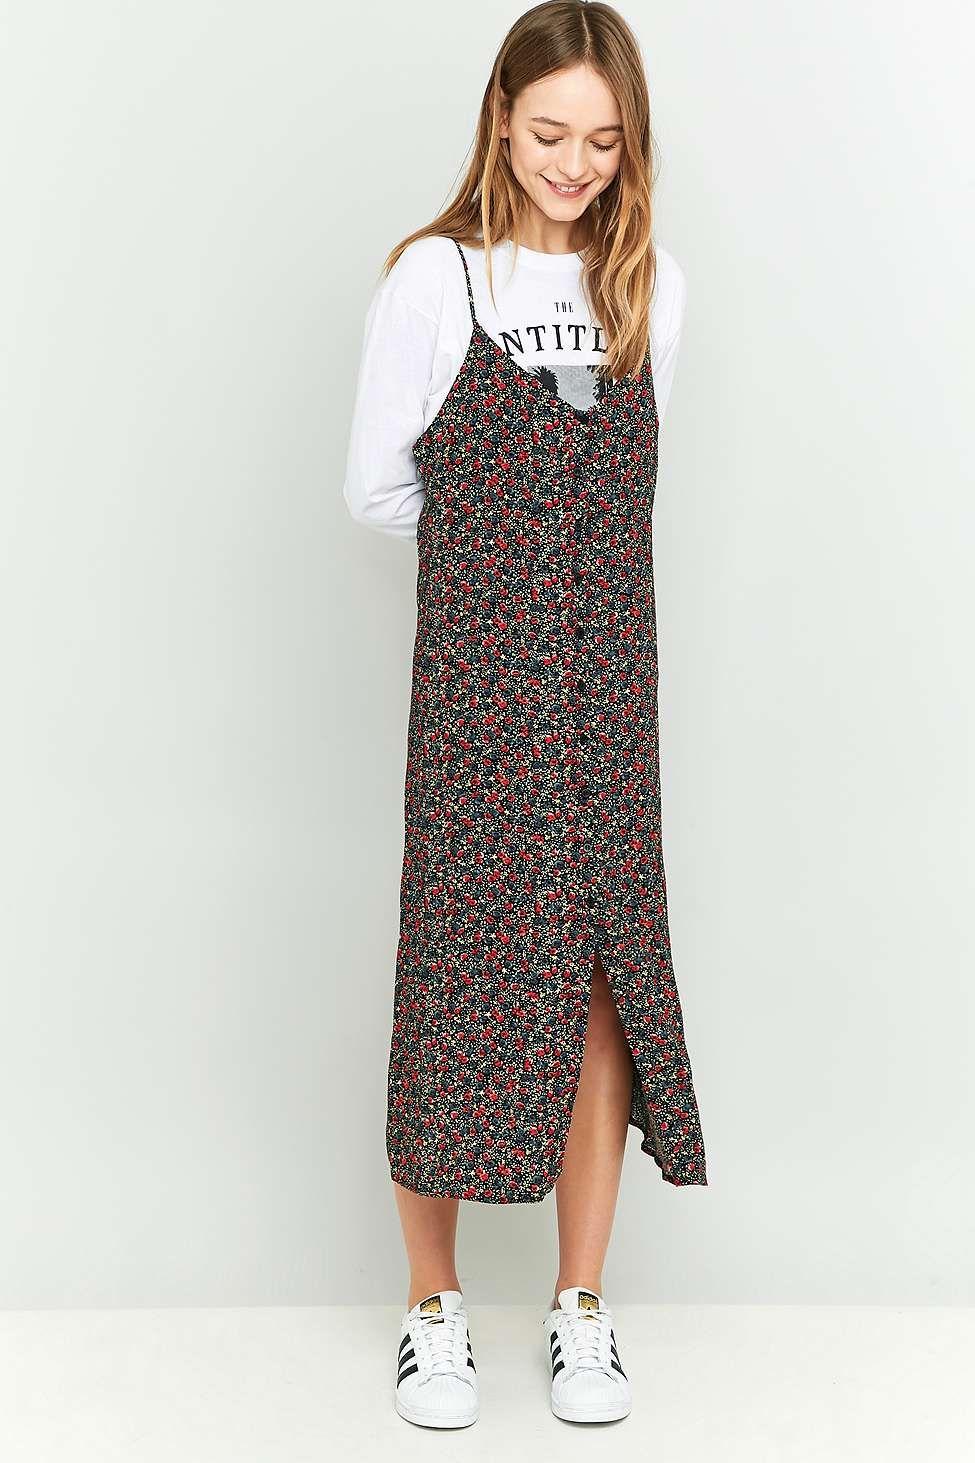 089a139138307 Pins & Needles Button-Down Floral Black Midi Slip Dress | Clothes ...